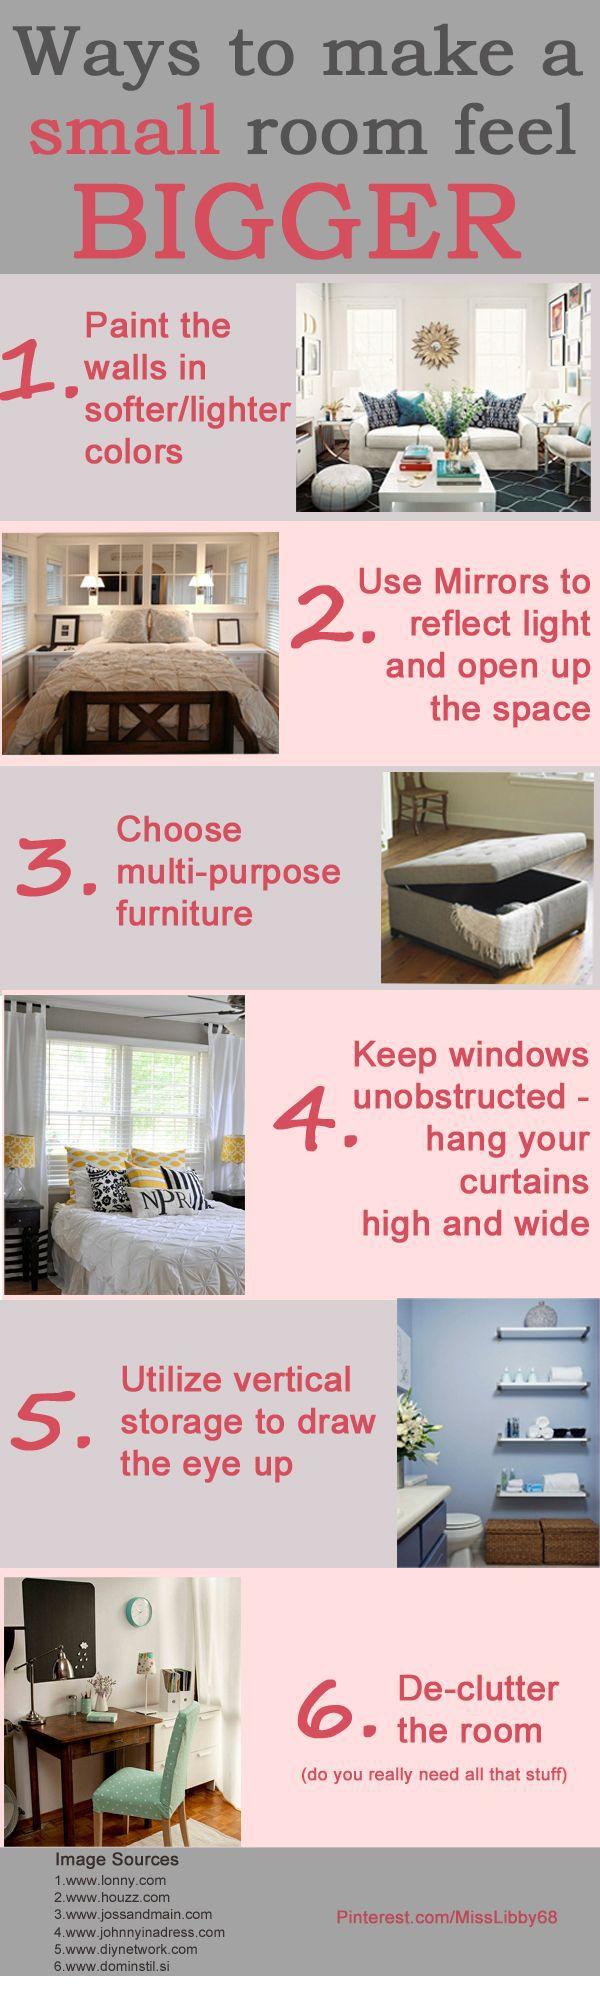 Diy Small Bedroom Ideas Pinterest | Best Interior & Furniture